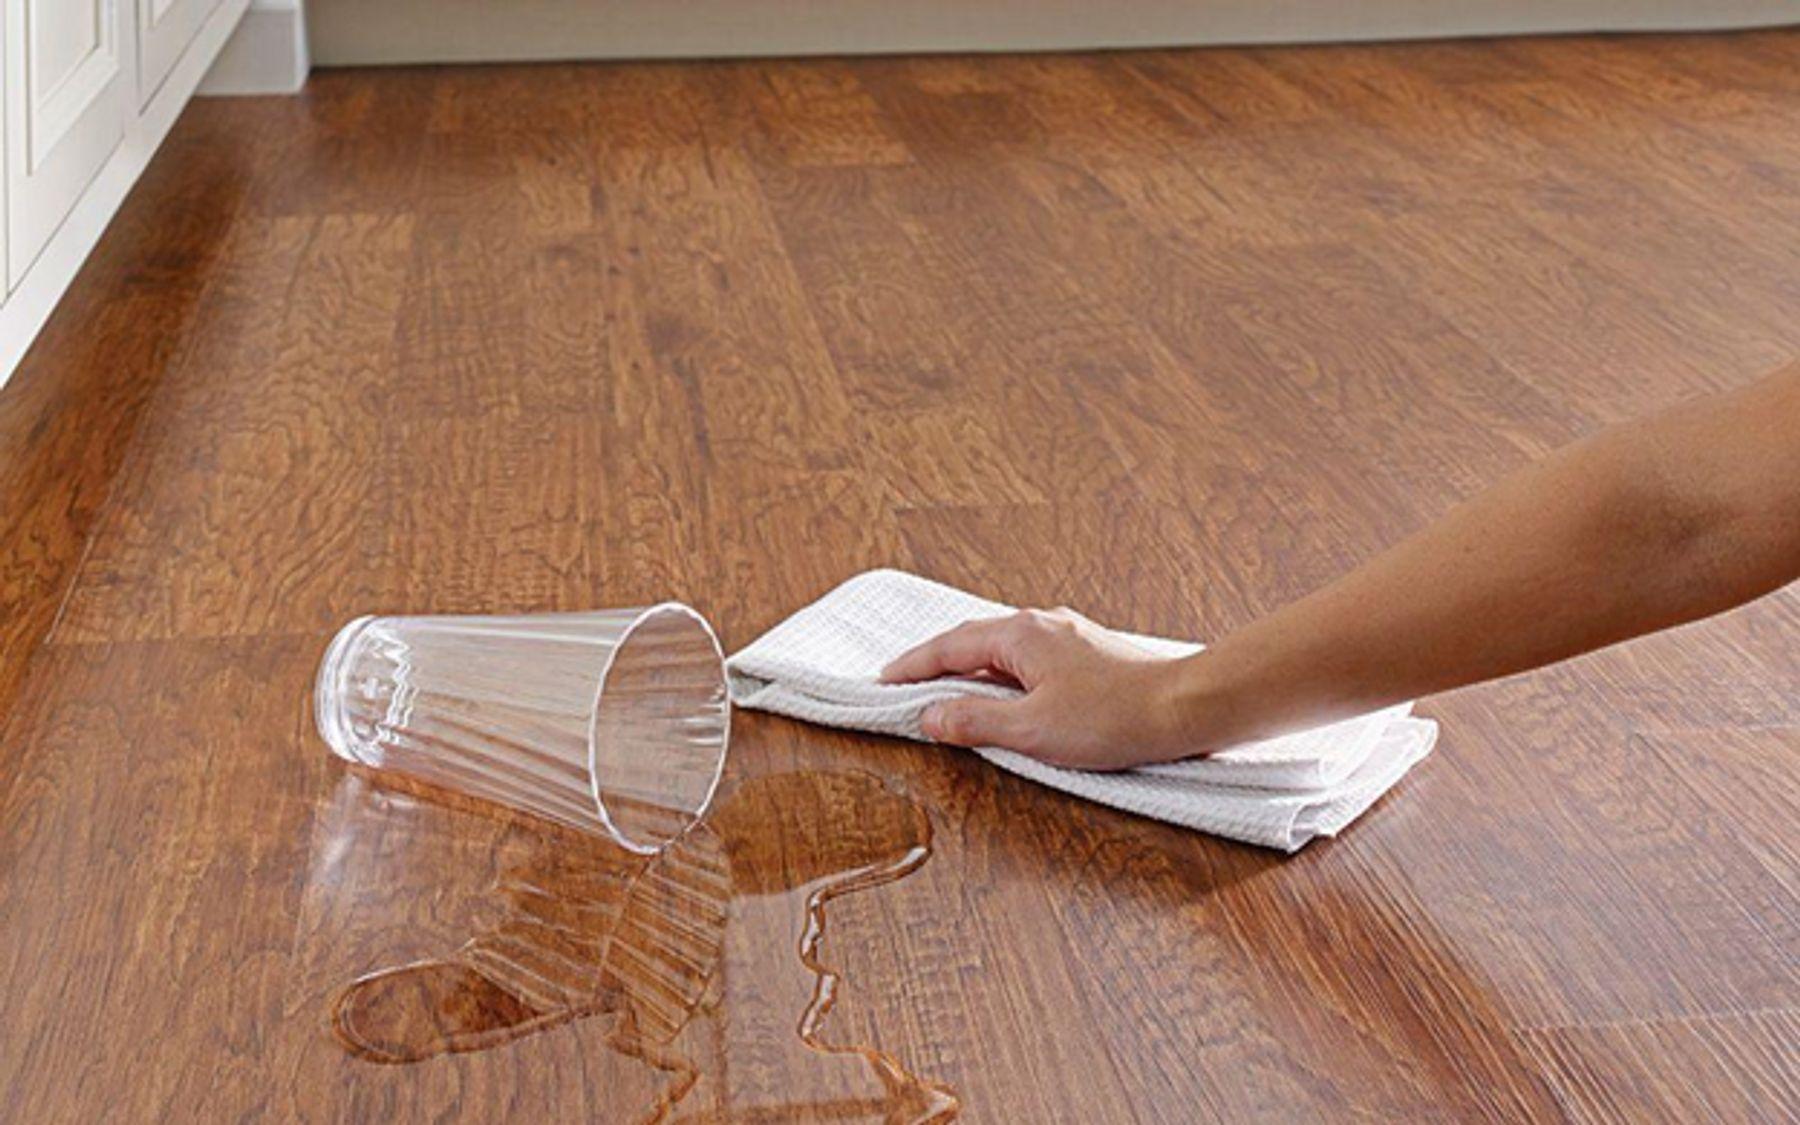 Step 1: slippery floor glass water